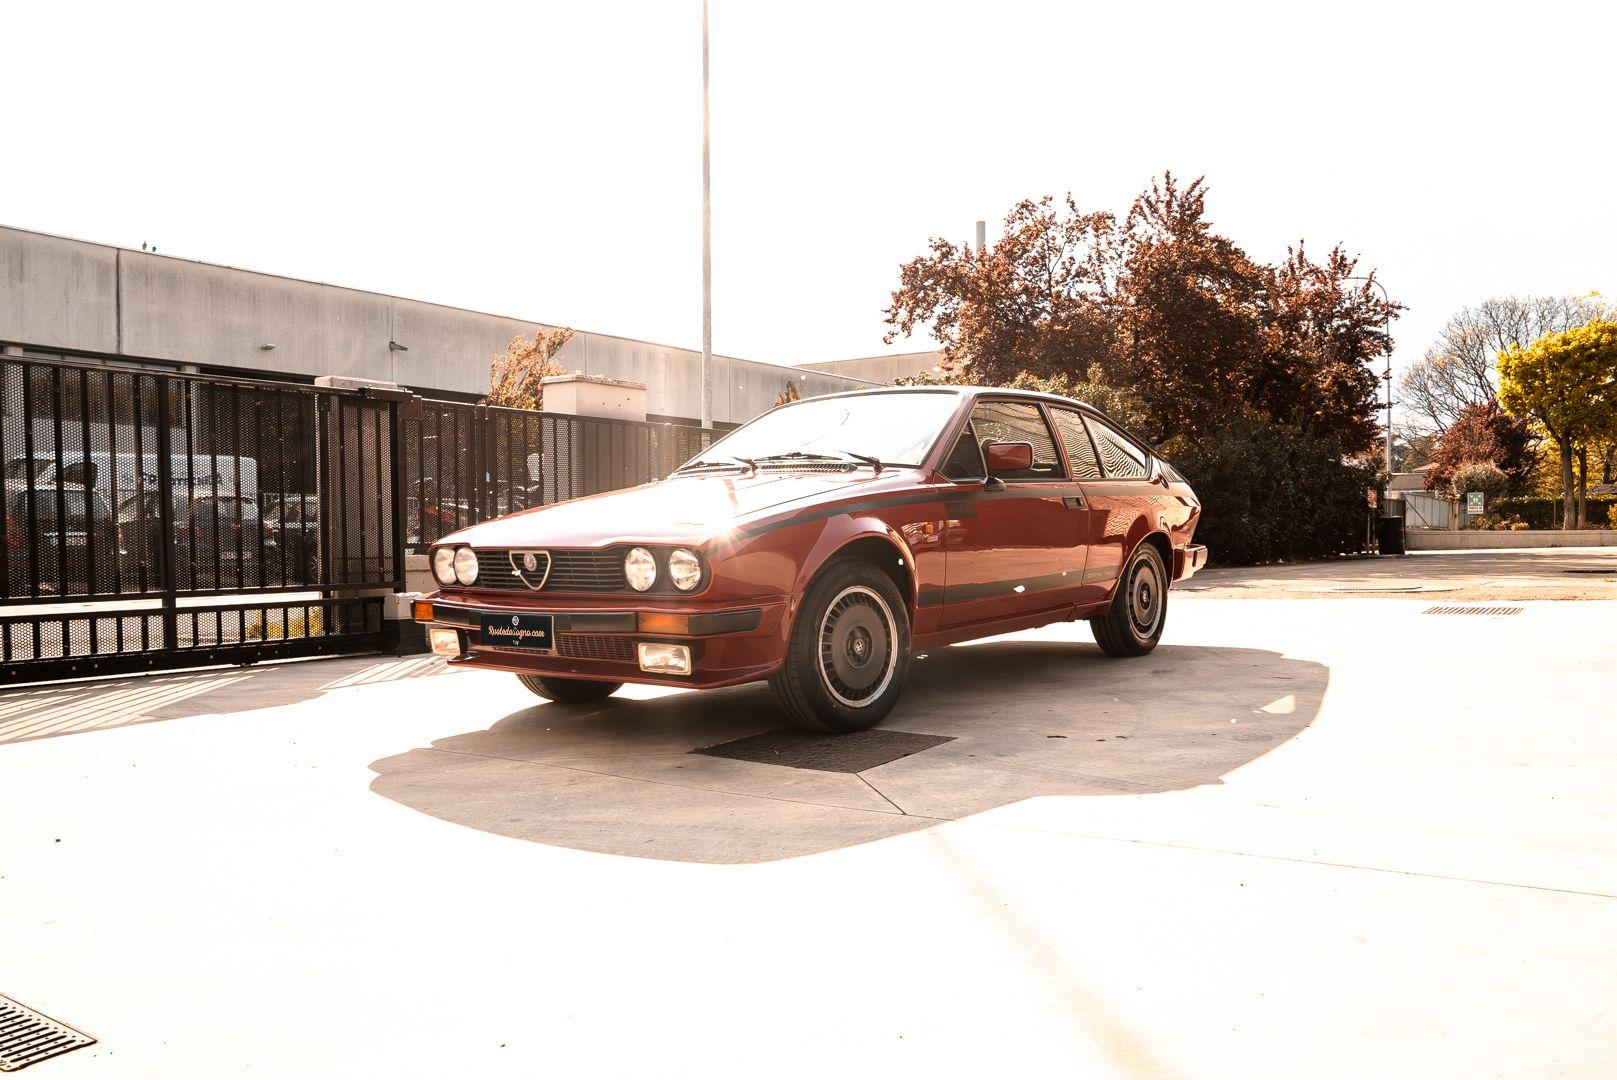 1981 Alfa Romeo Alfetta GTV Gran Prix no. 128 68564